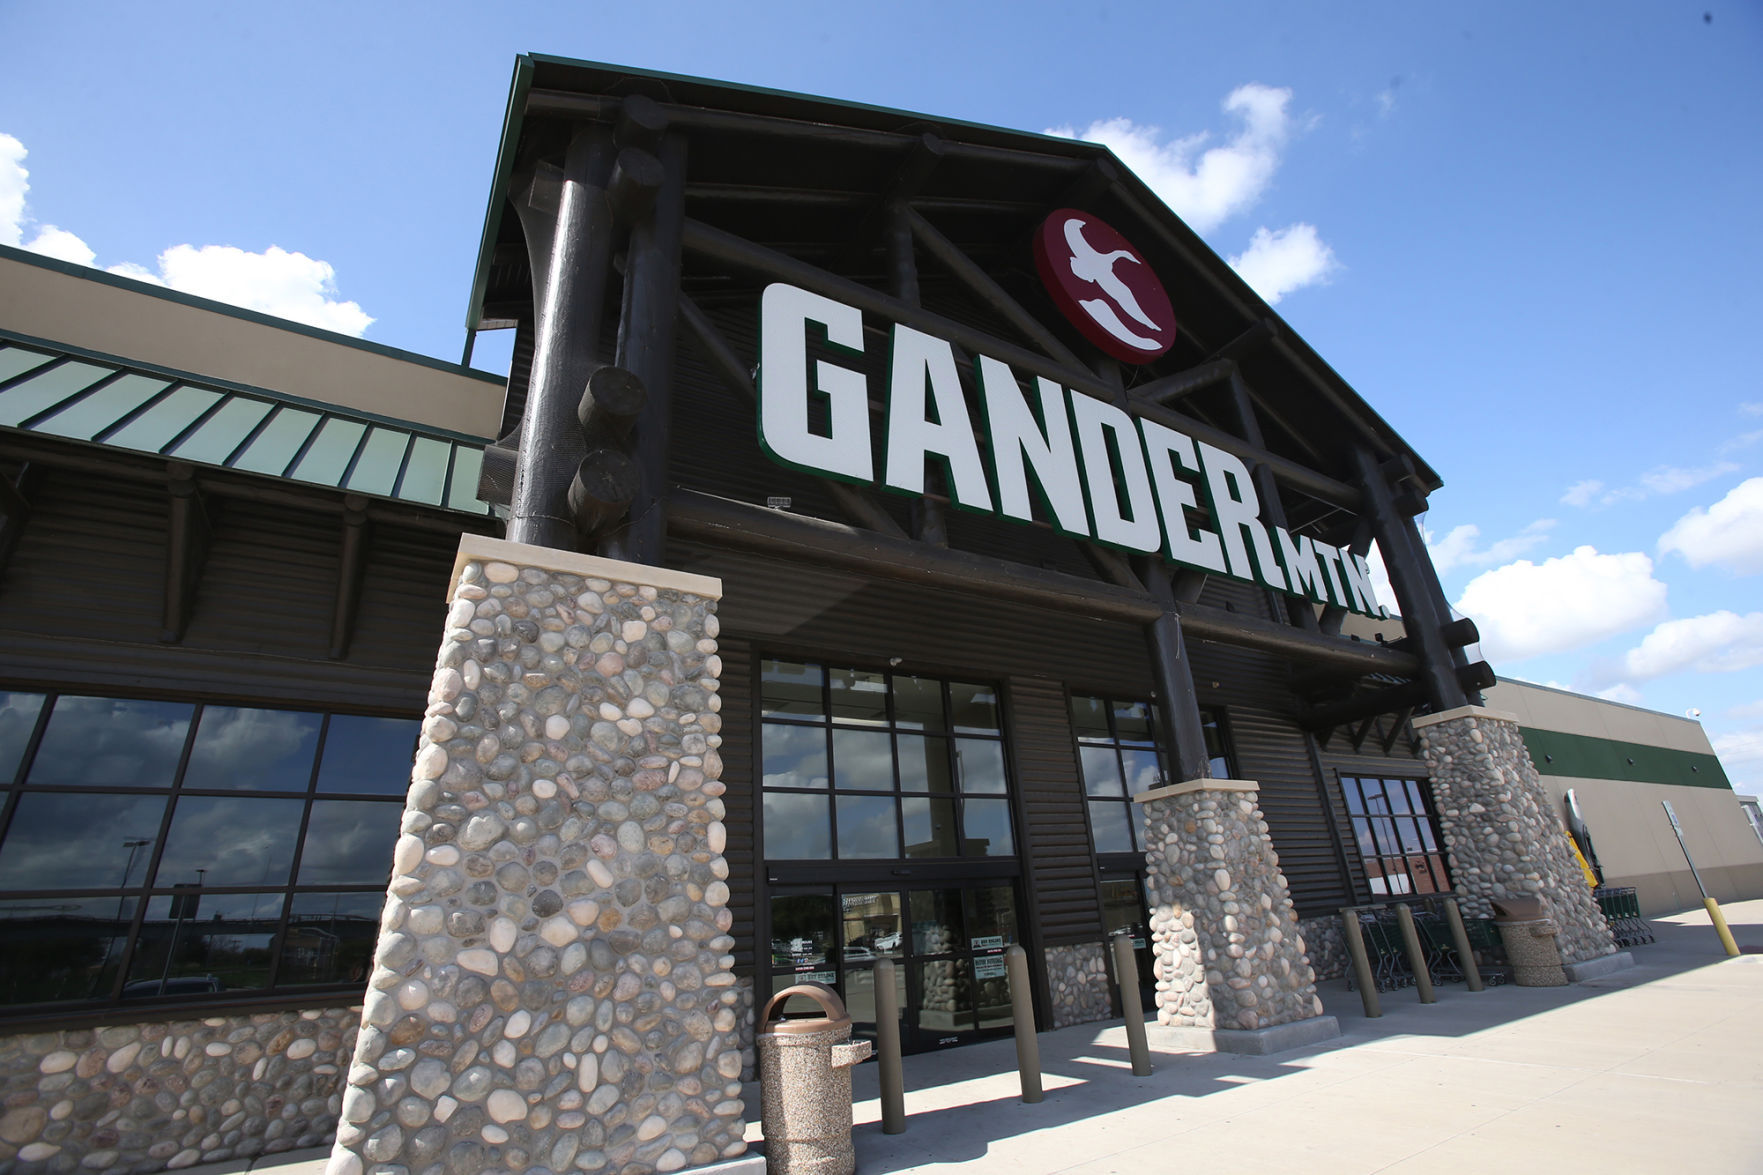 Waco's Gander Mountain store to close | Business | wacotrib.com